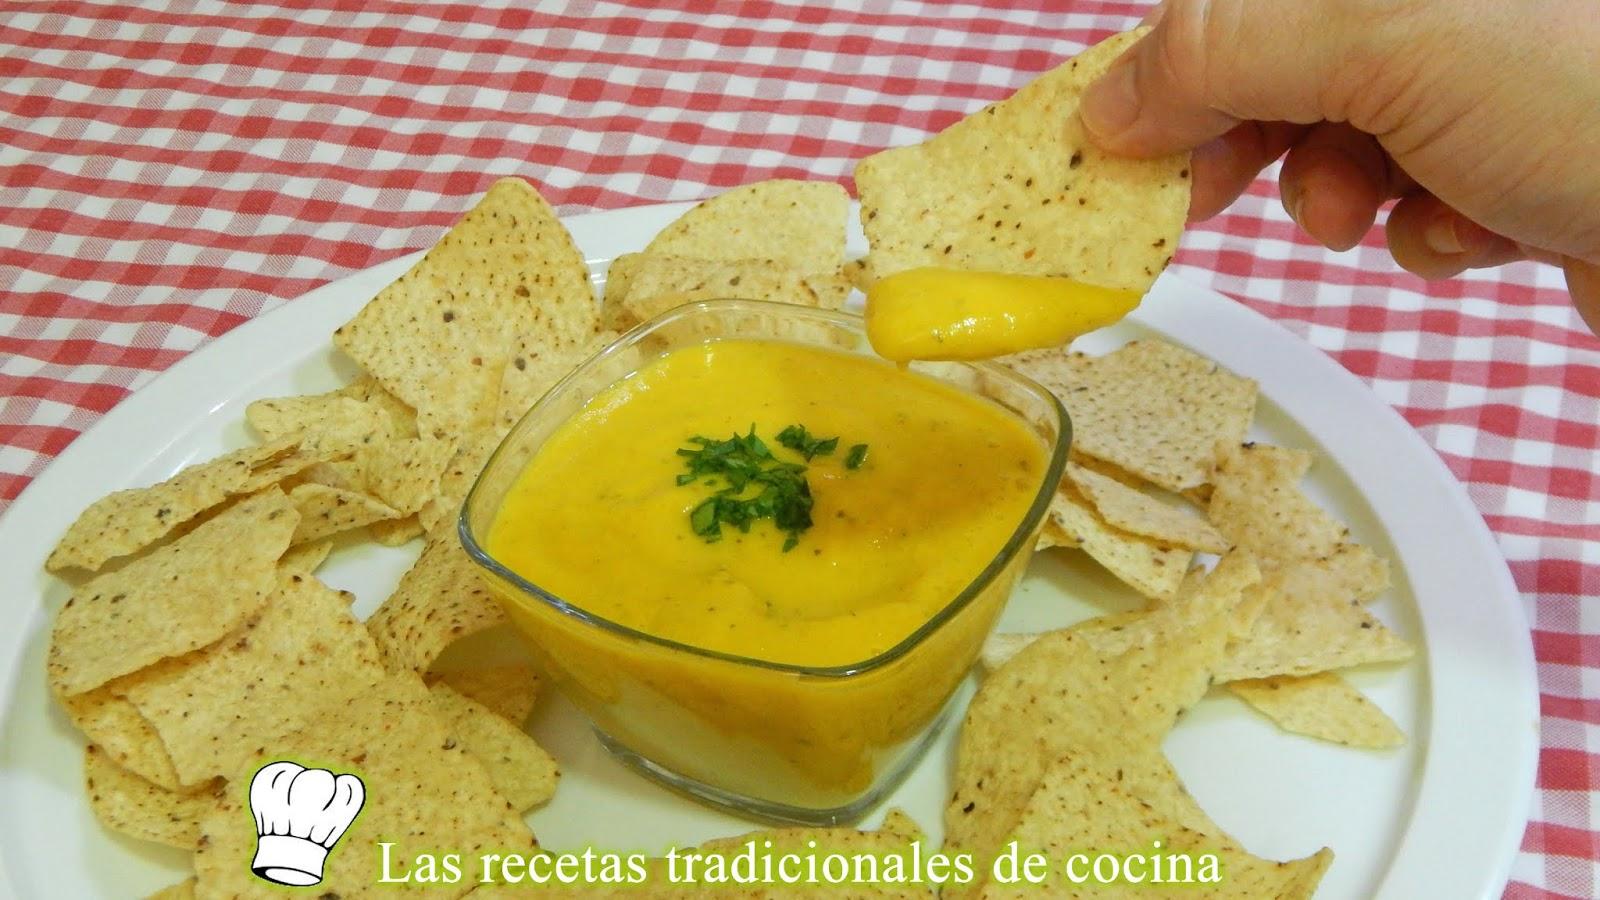 Receta Fácil De Salsa De Mango Ideal Para Dipear